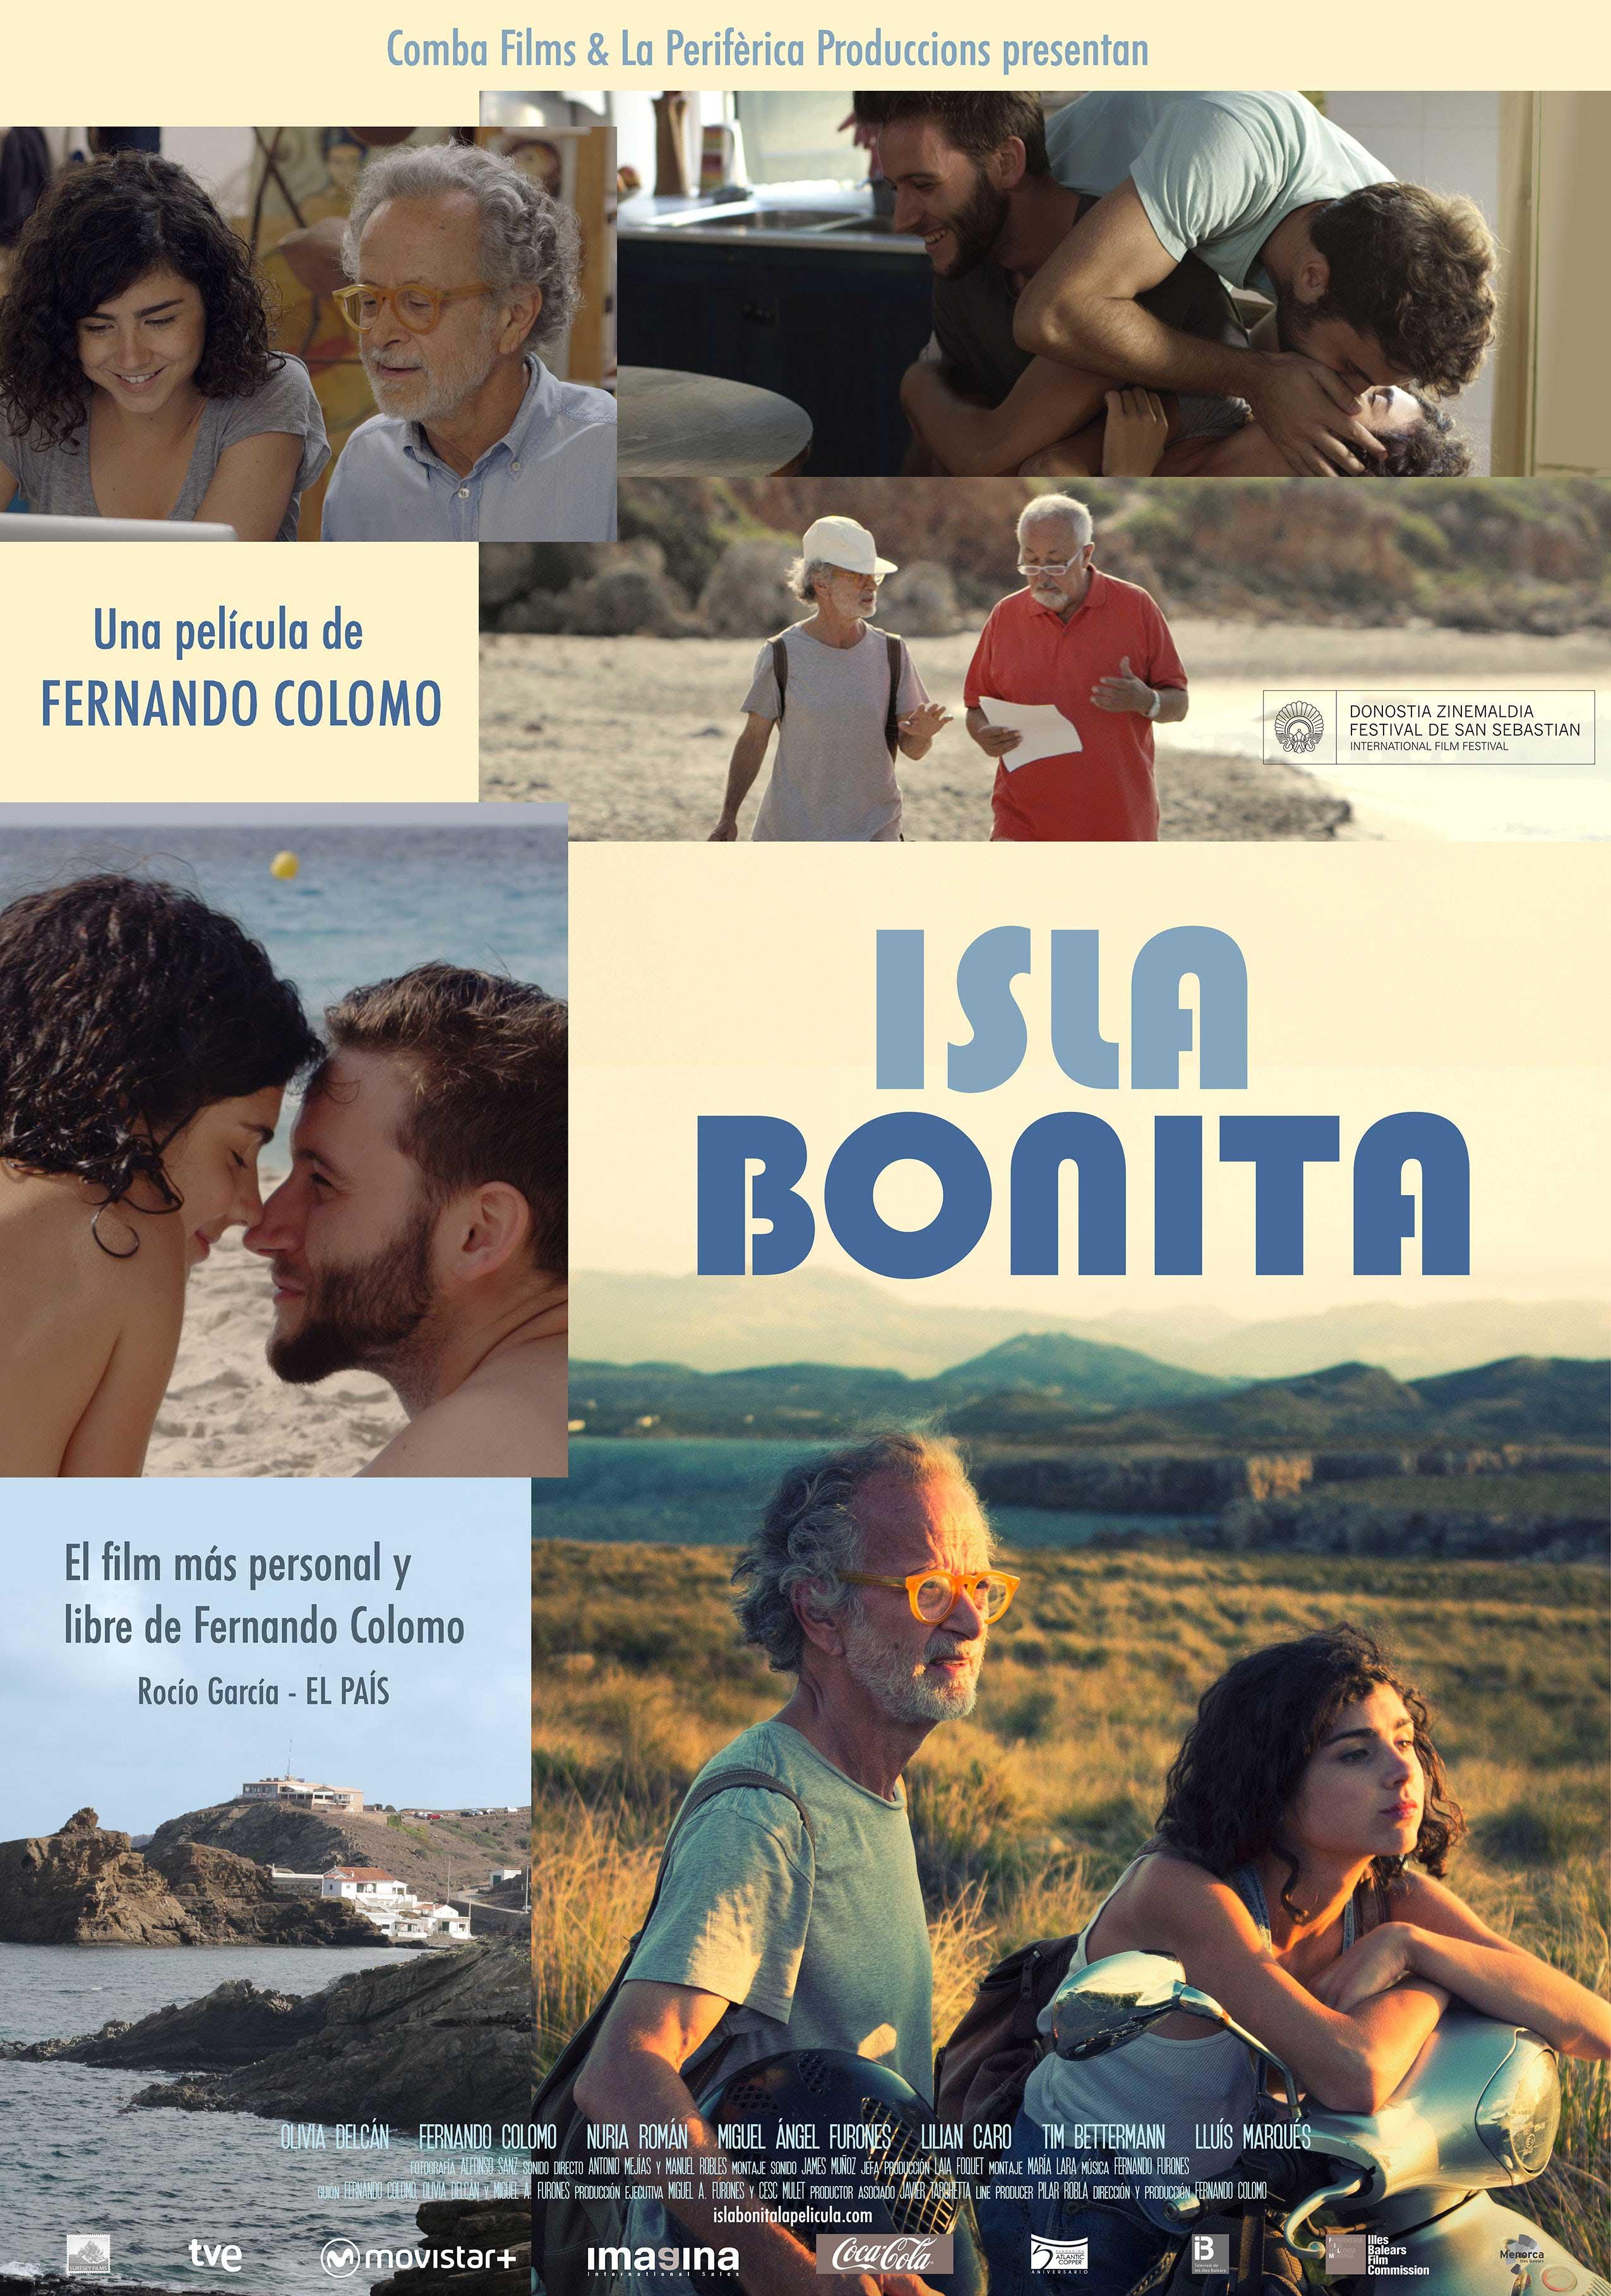 Isla-Bonita-cartel-pelicula